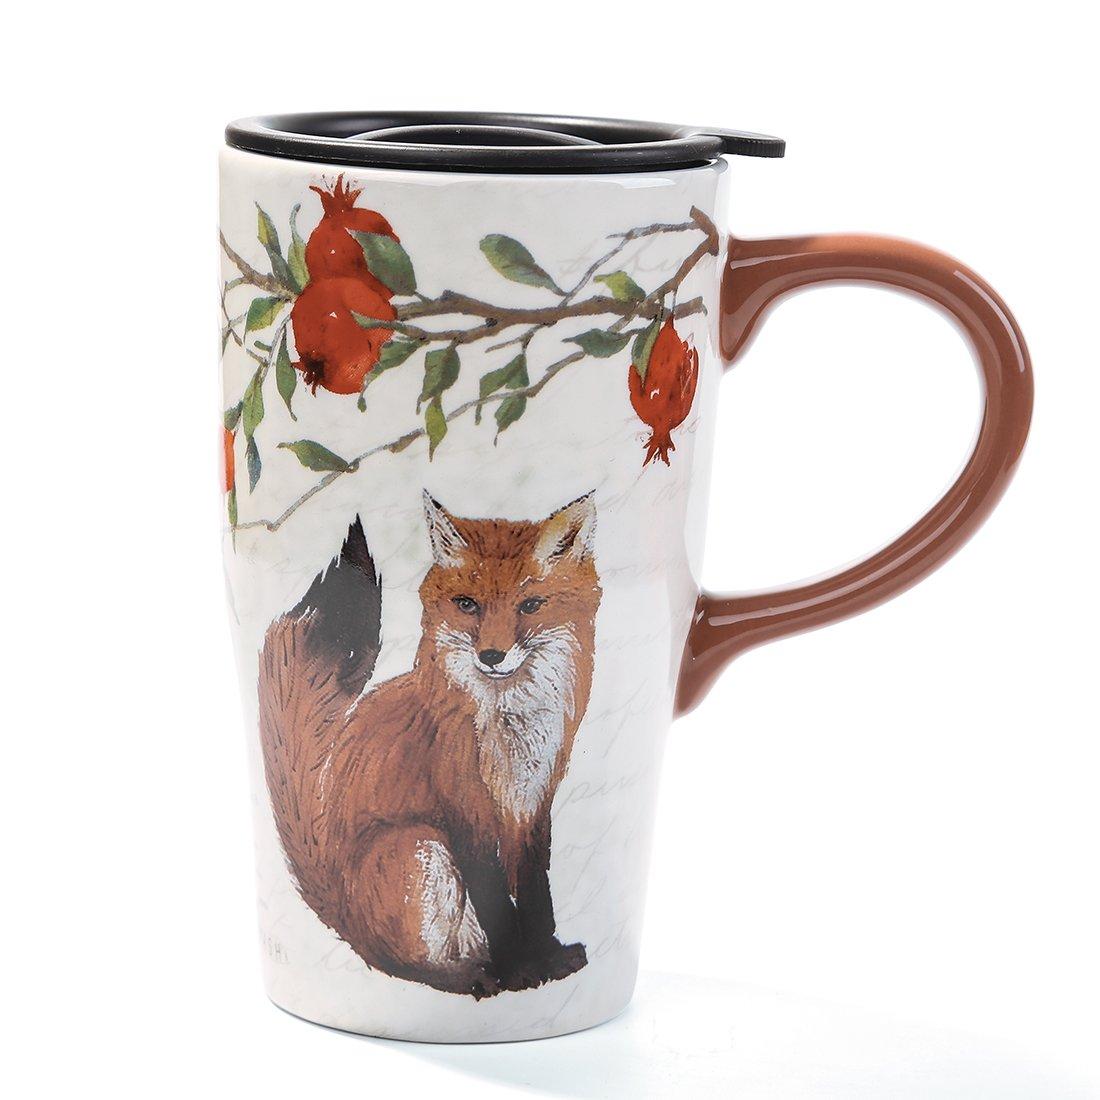 Minigift Ceramic Travel Coffee Mug 17oz (11 Designs for choice-Fox)